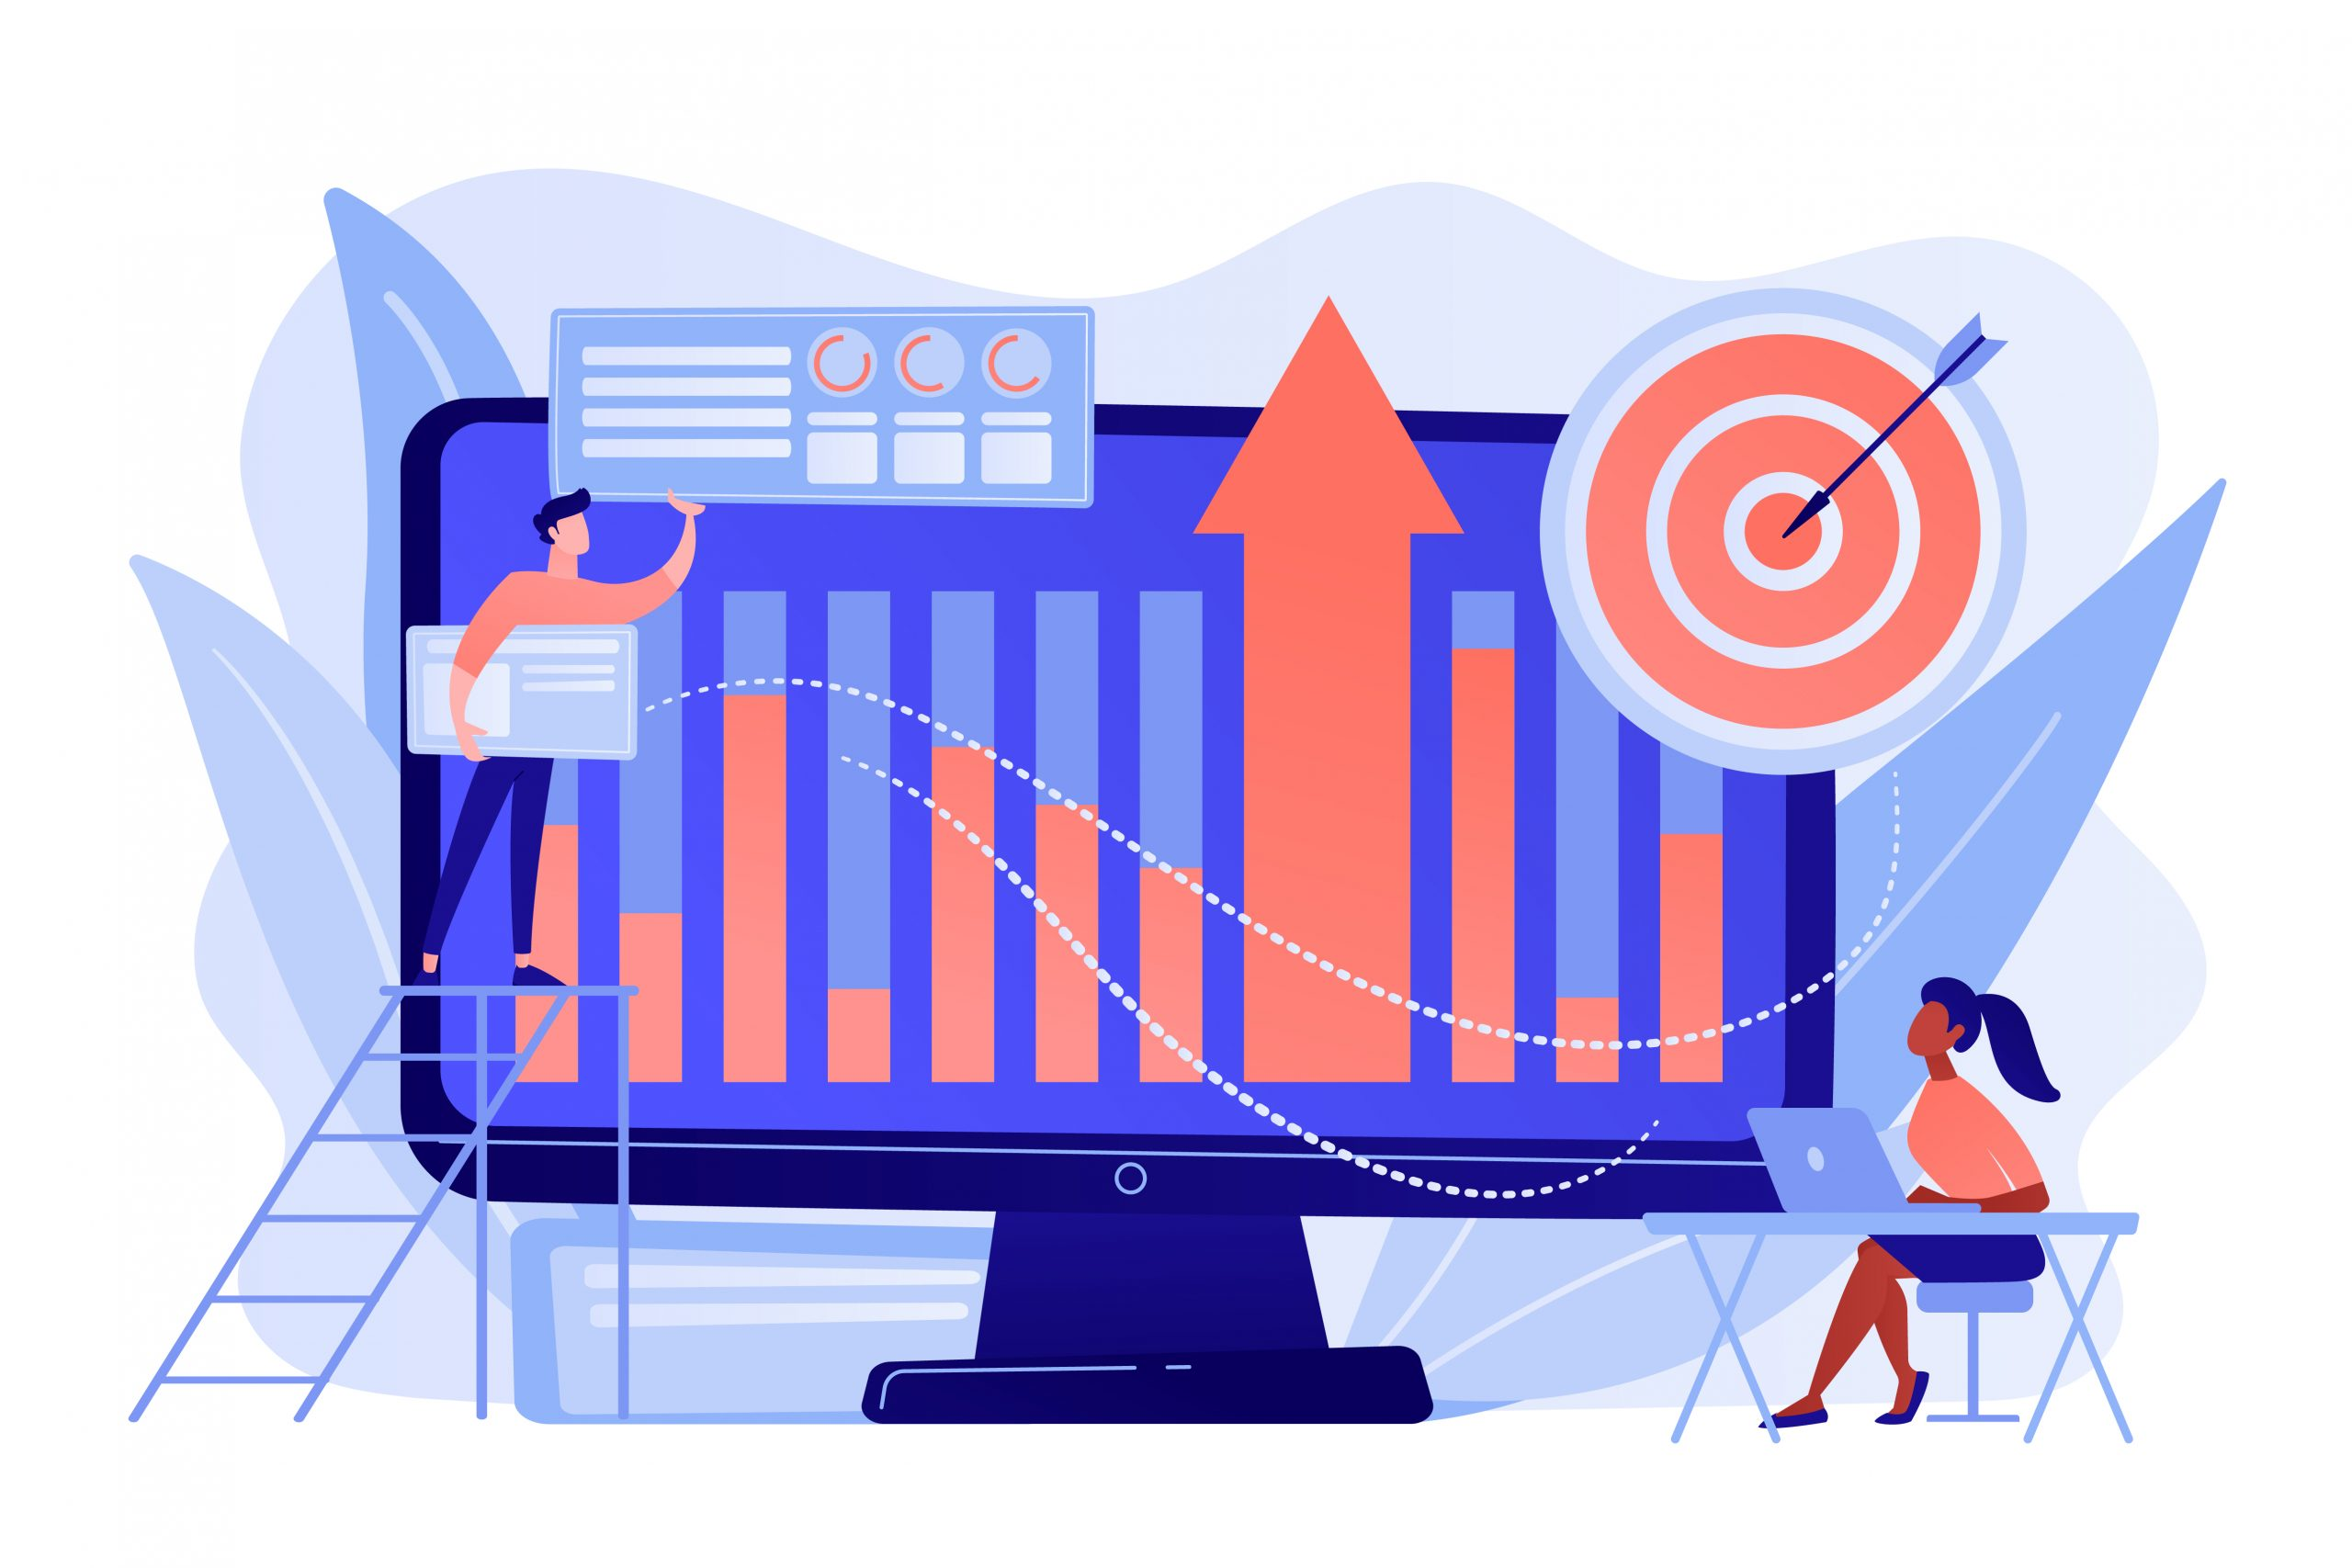 Analytics tool, data-driven decisions